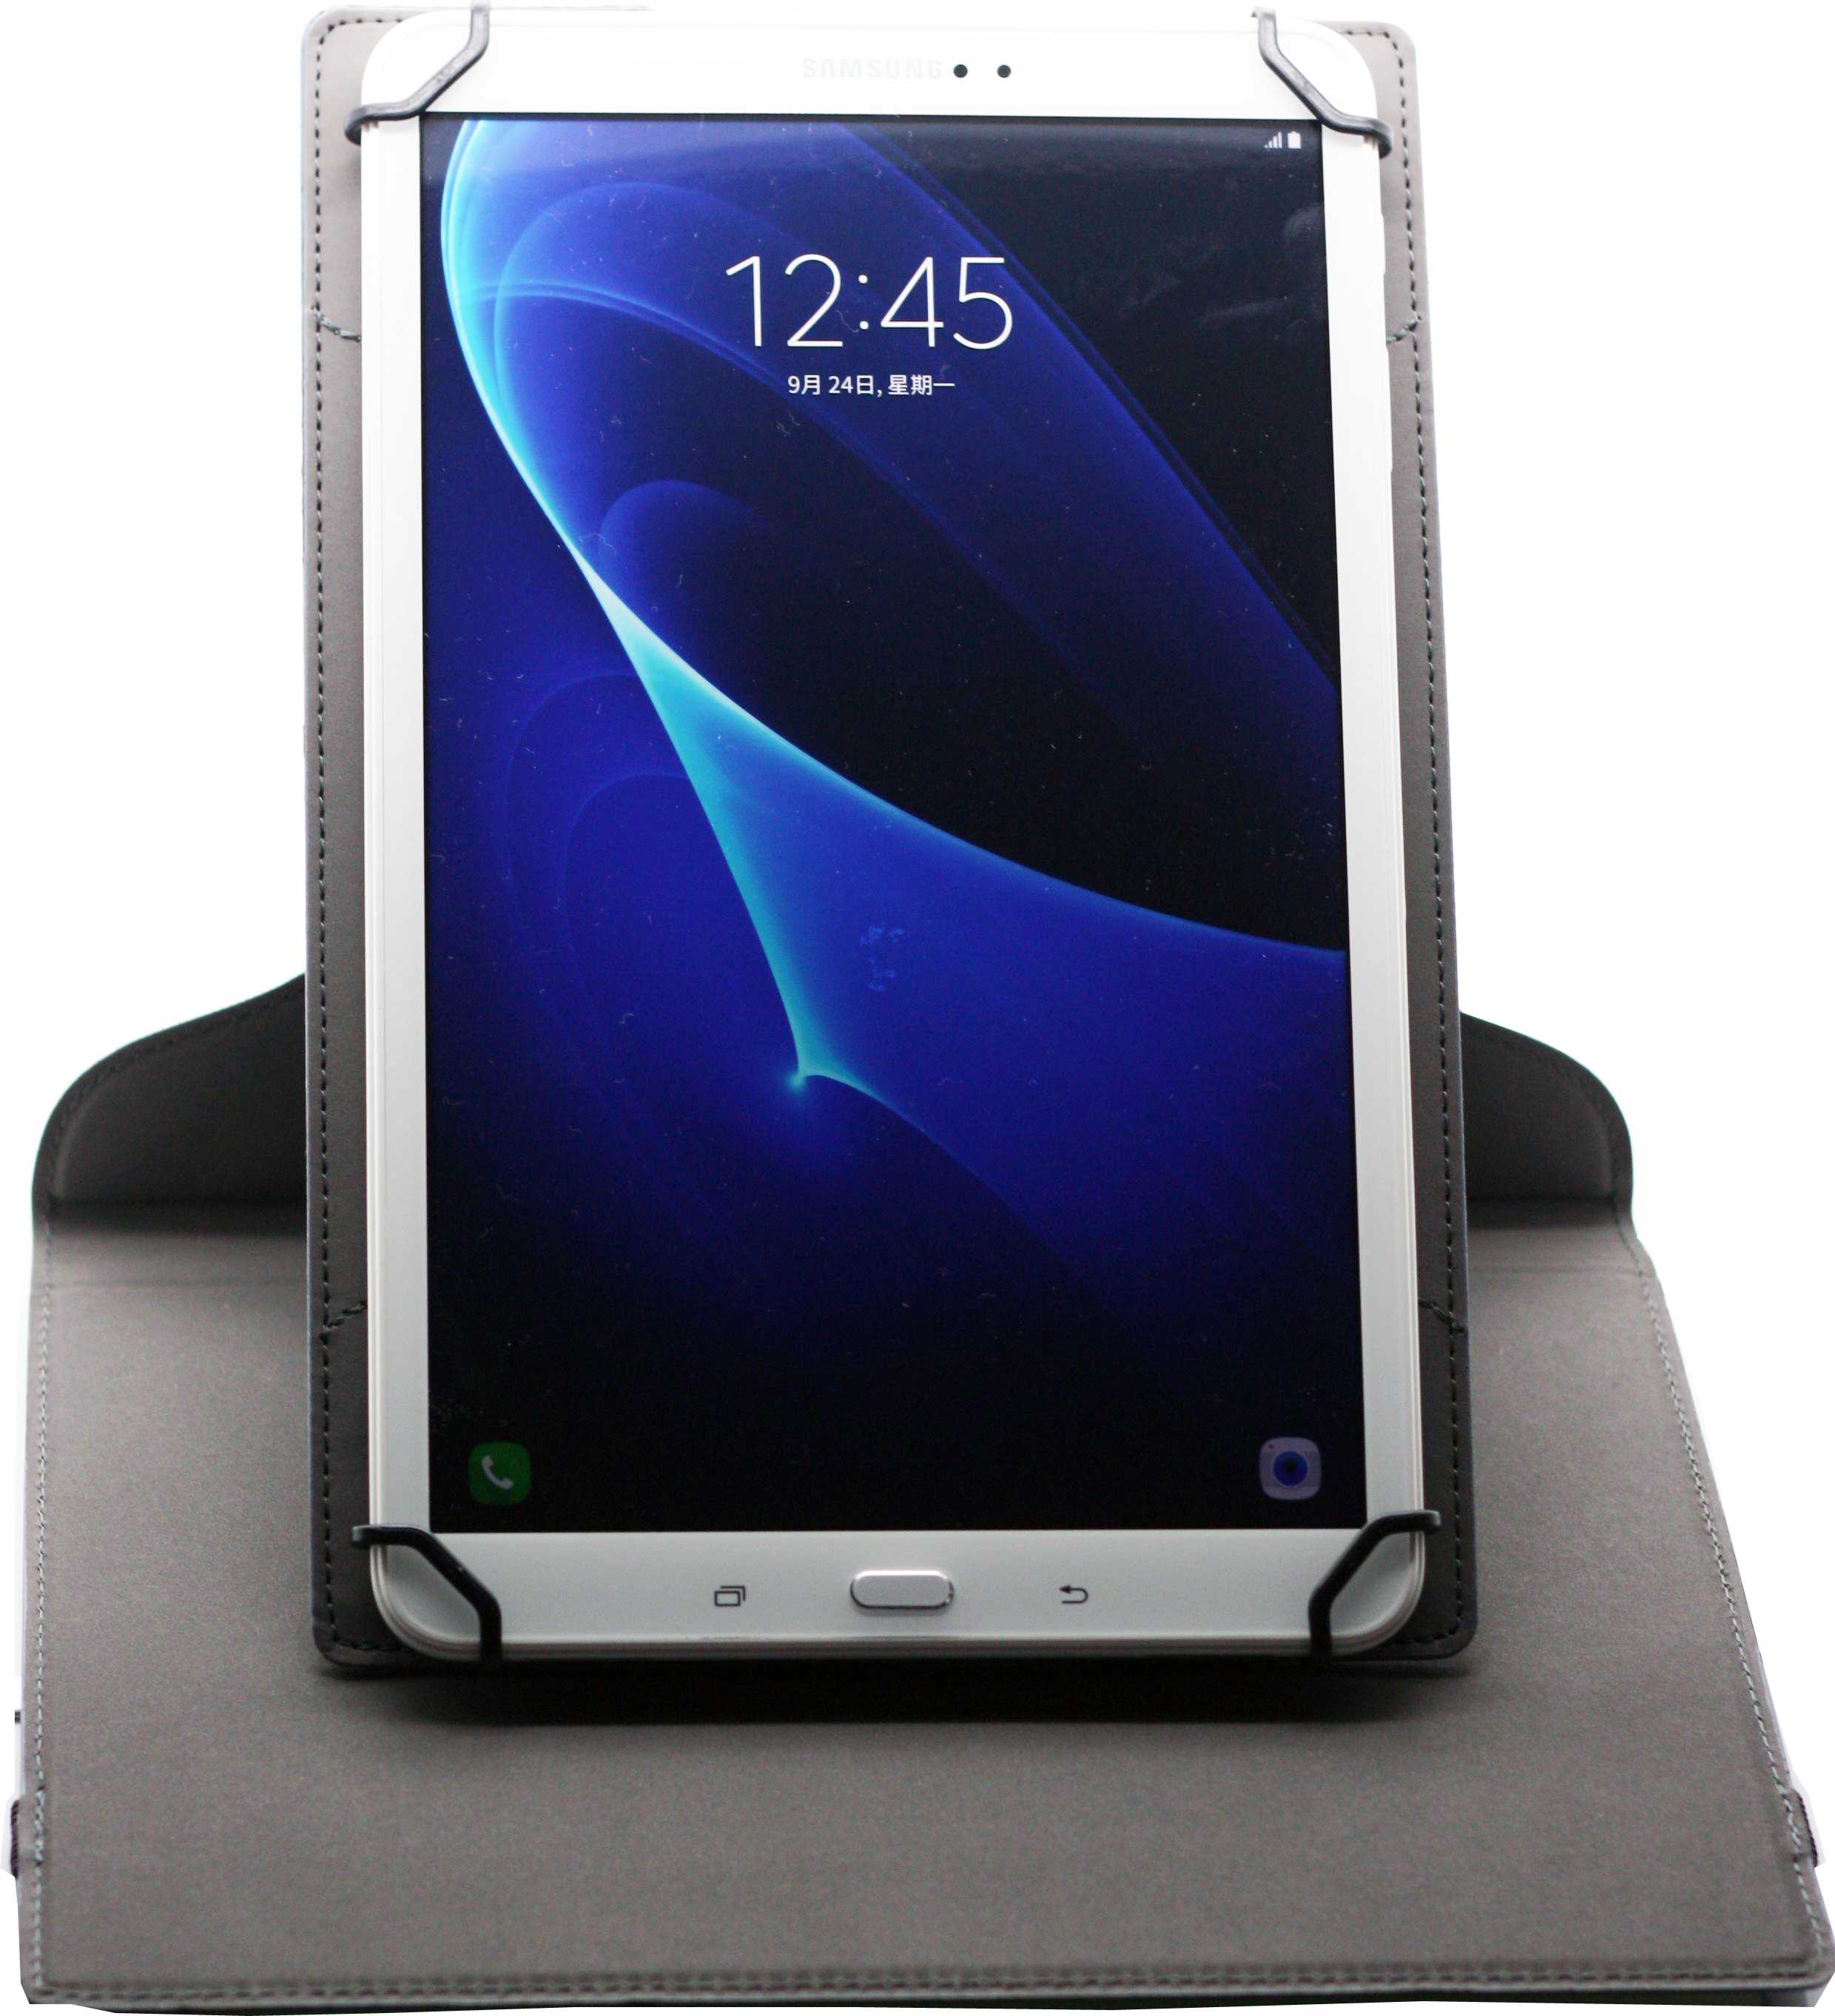 etui tablette samsung tab a e s2 s3 a2016 sams 9 6 10 1. Black Bedroom Furniture Sets. Home Design Ideas